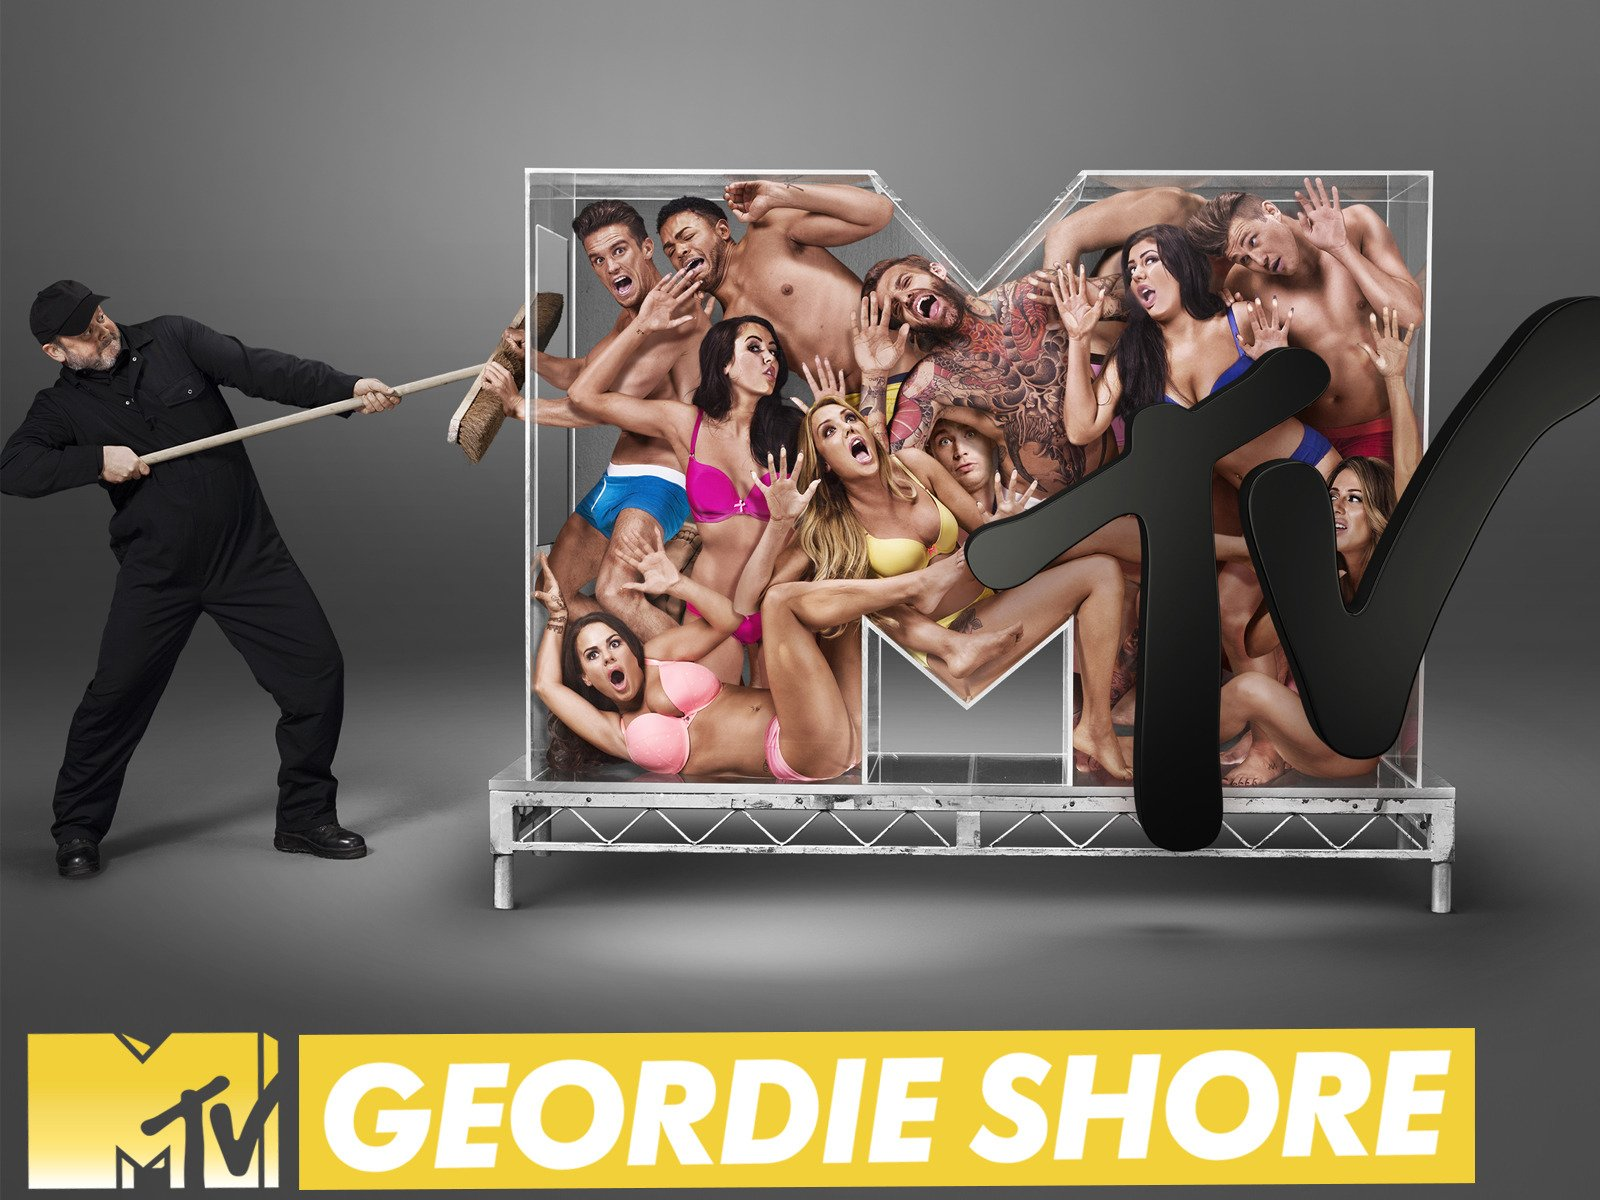 Geordie Shore on Amazon Prime Video UK